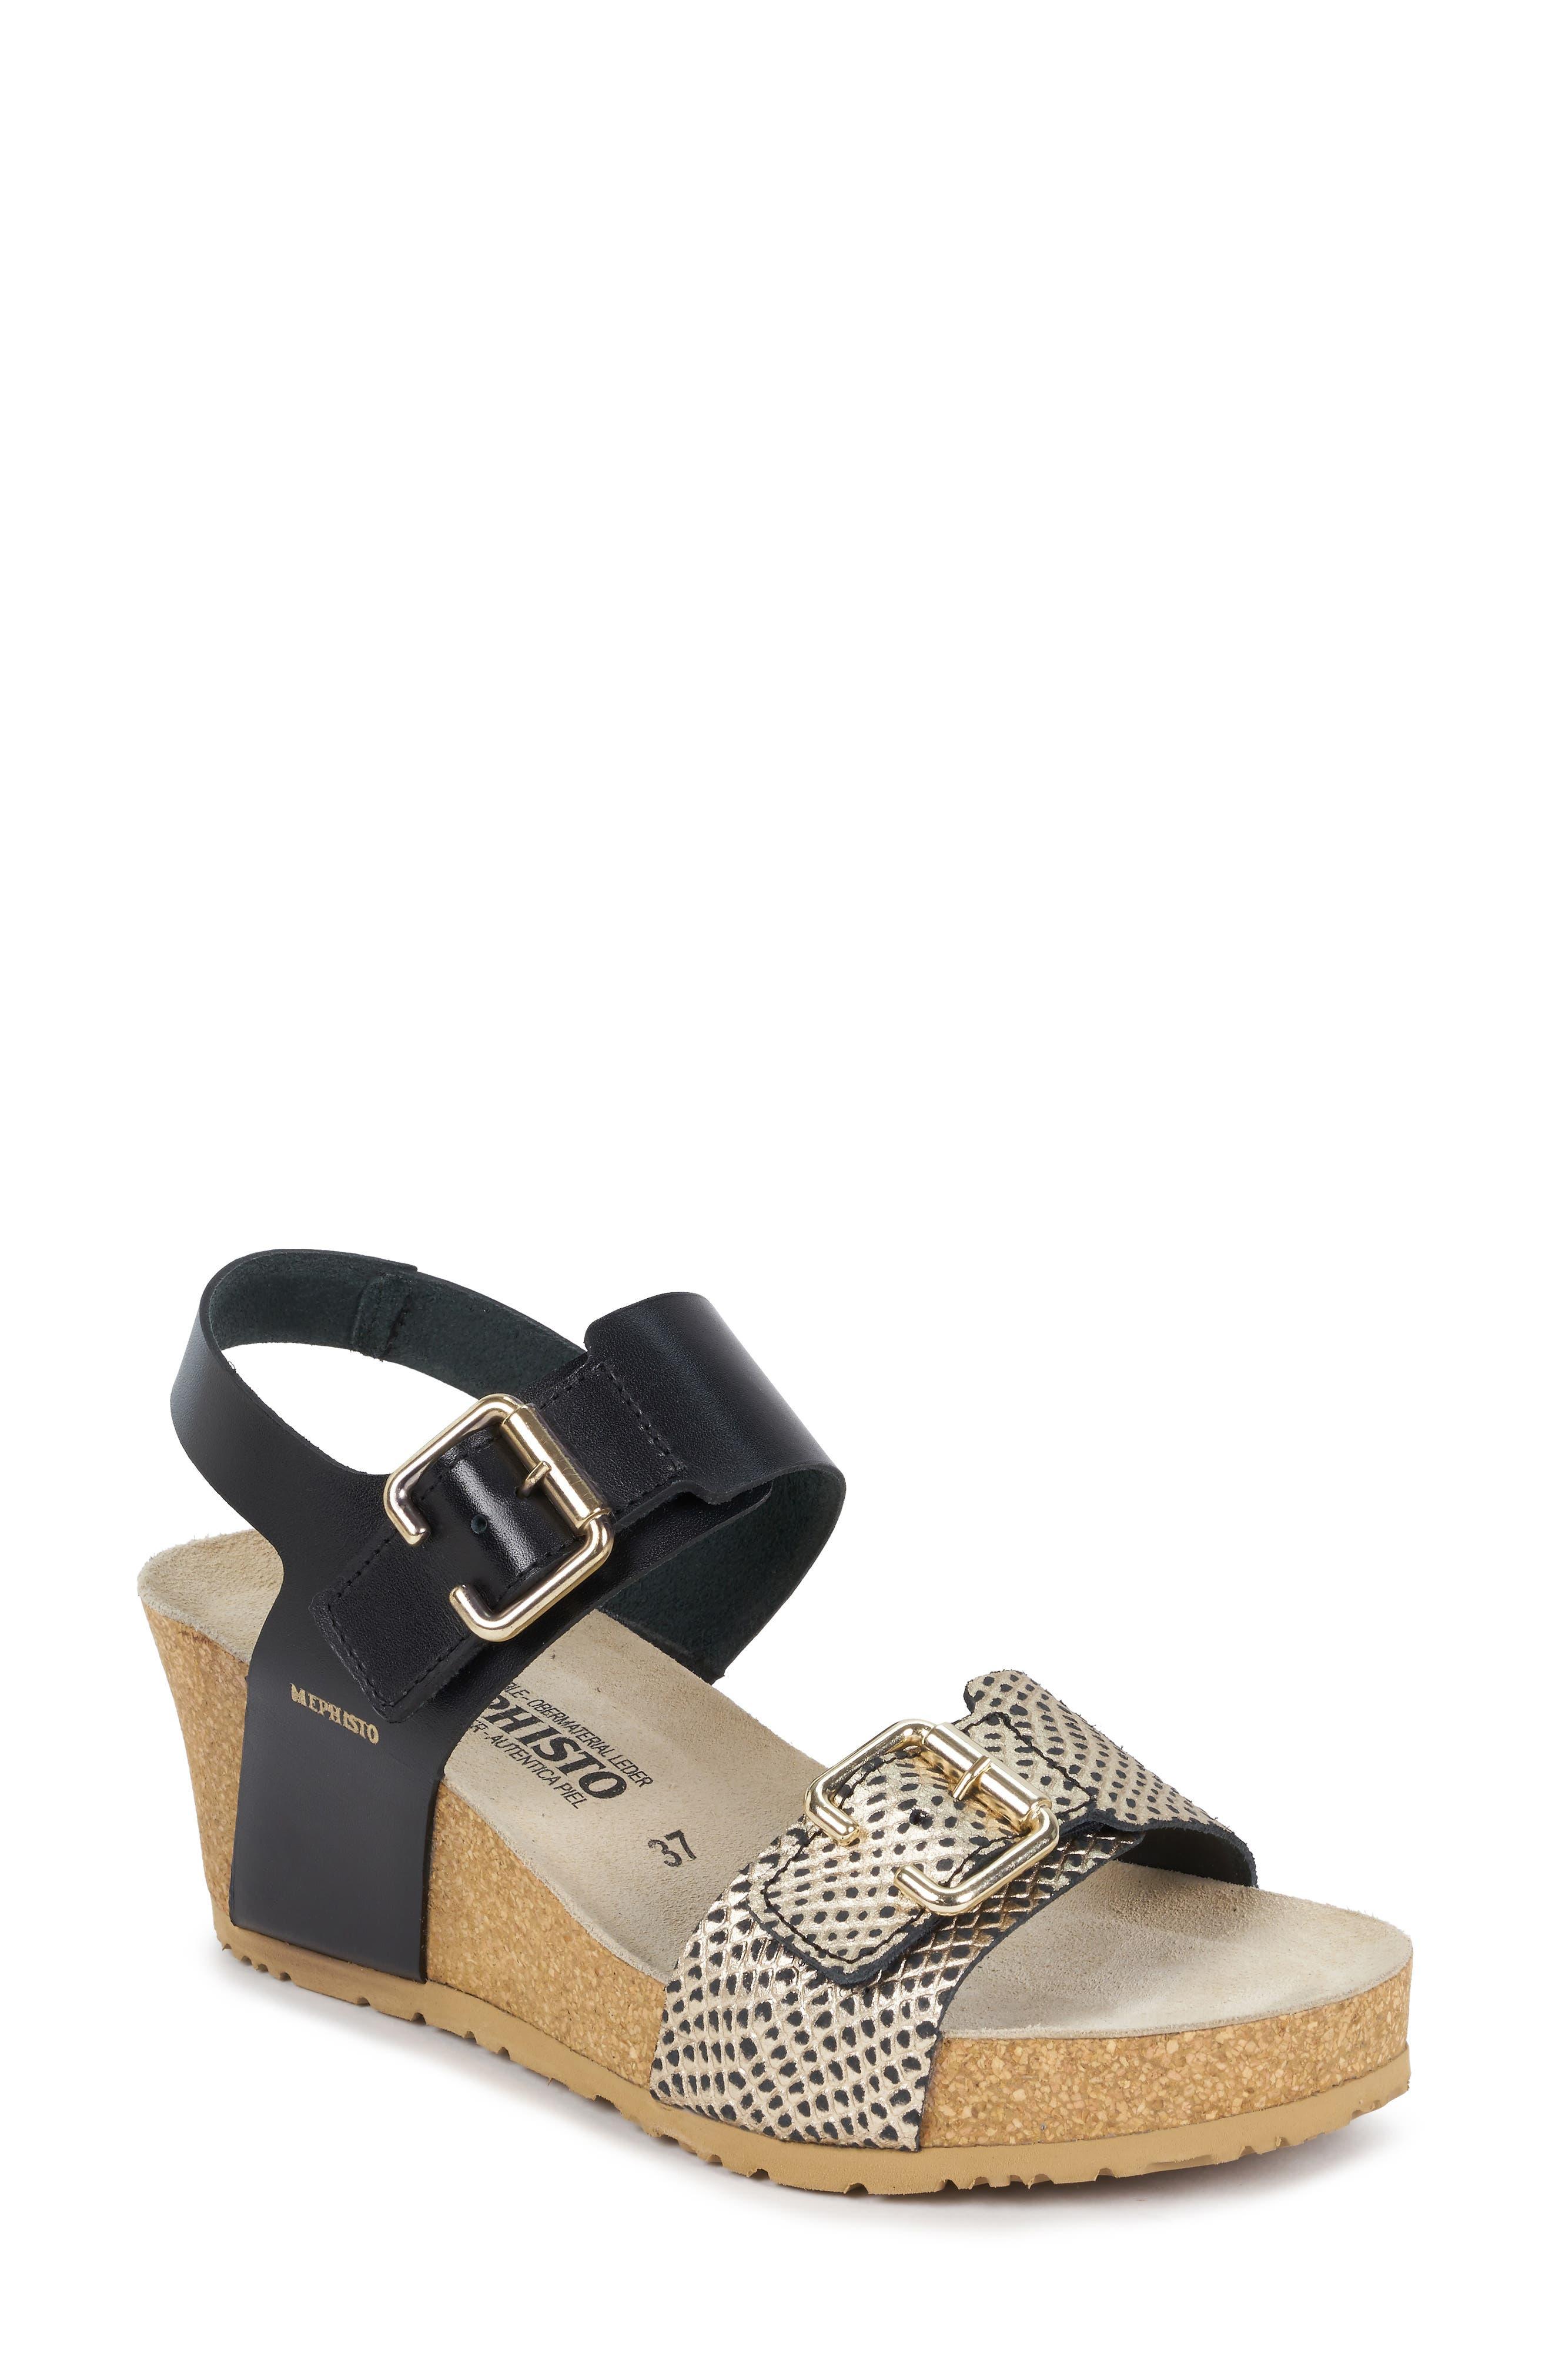 Lissandra Platform Wedge Sandal,                             Main thumbnail 1, color,                             BLACK/ GOLD LEATHER